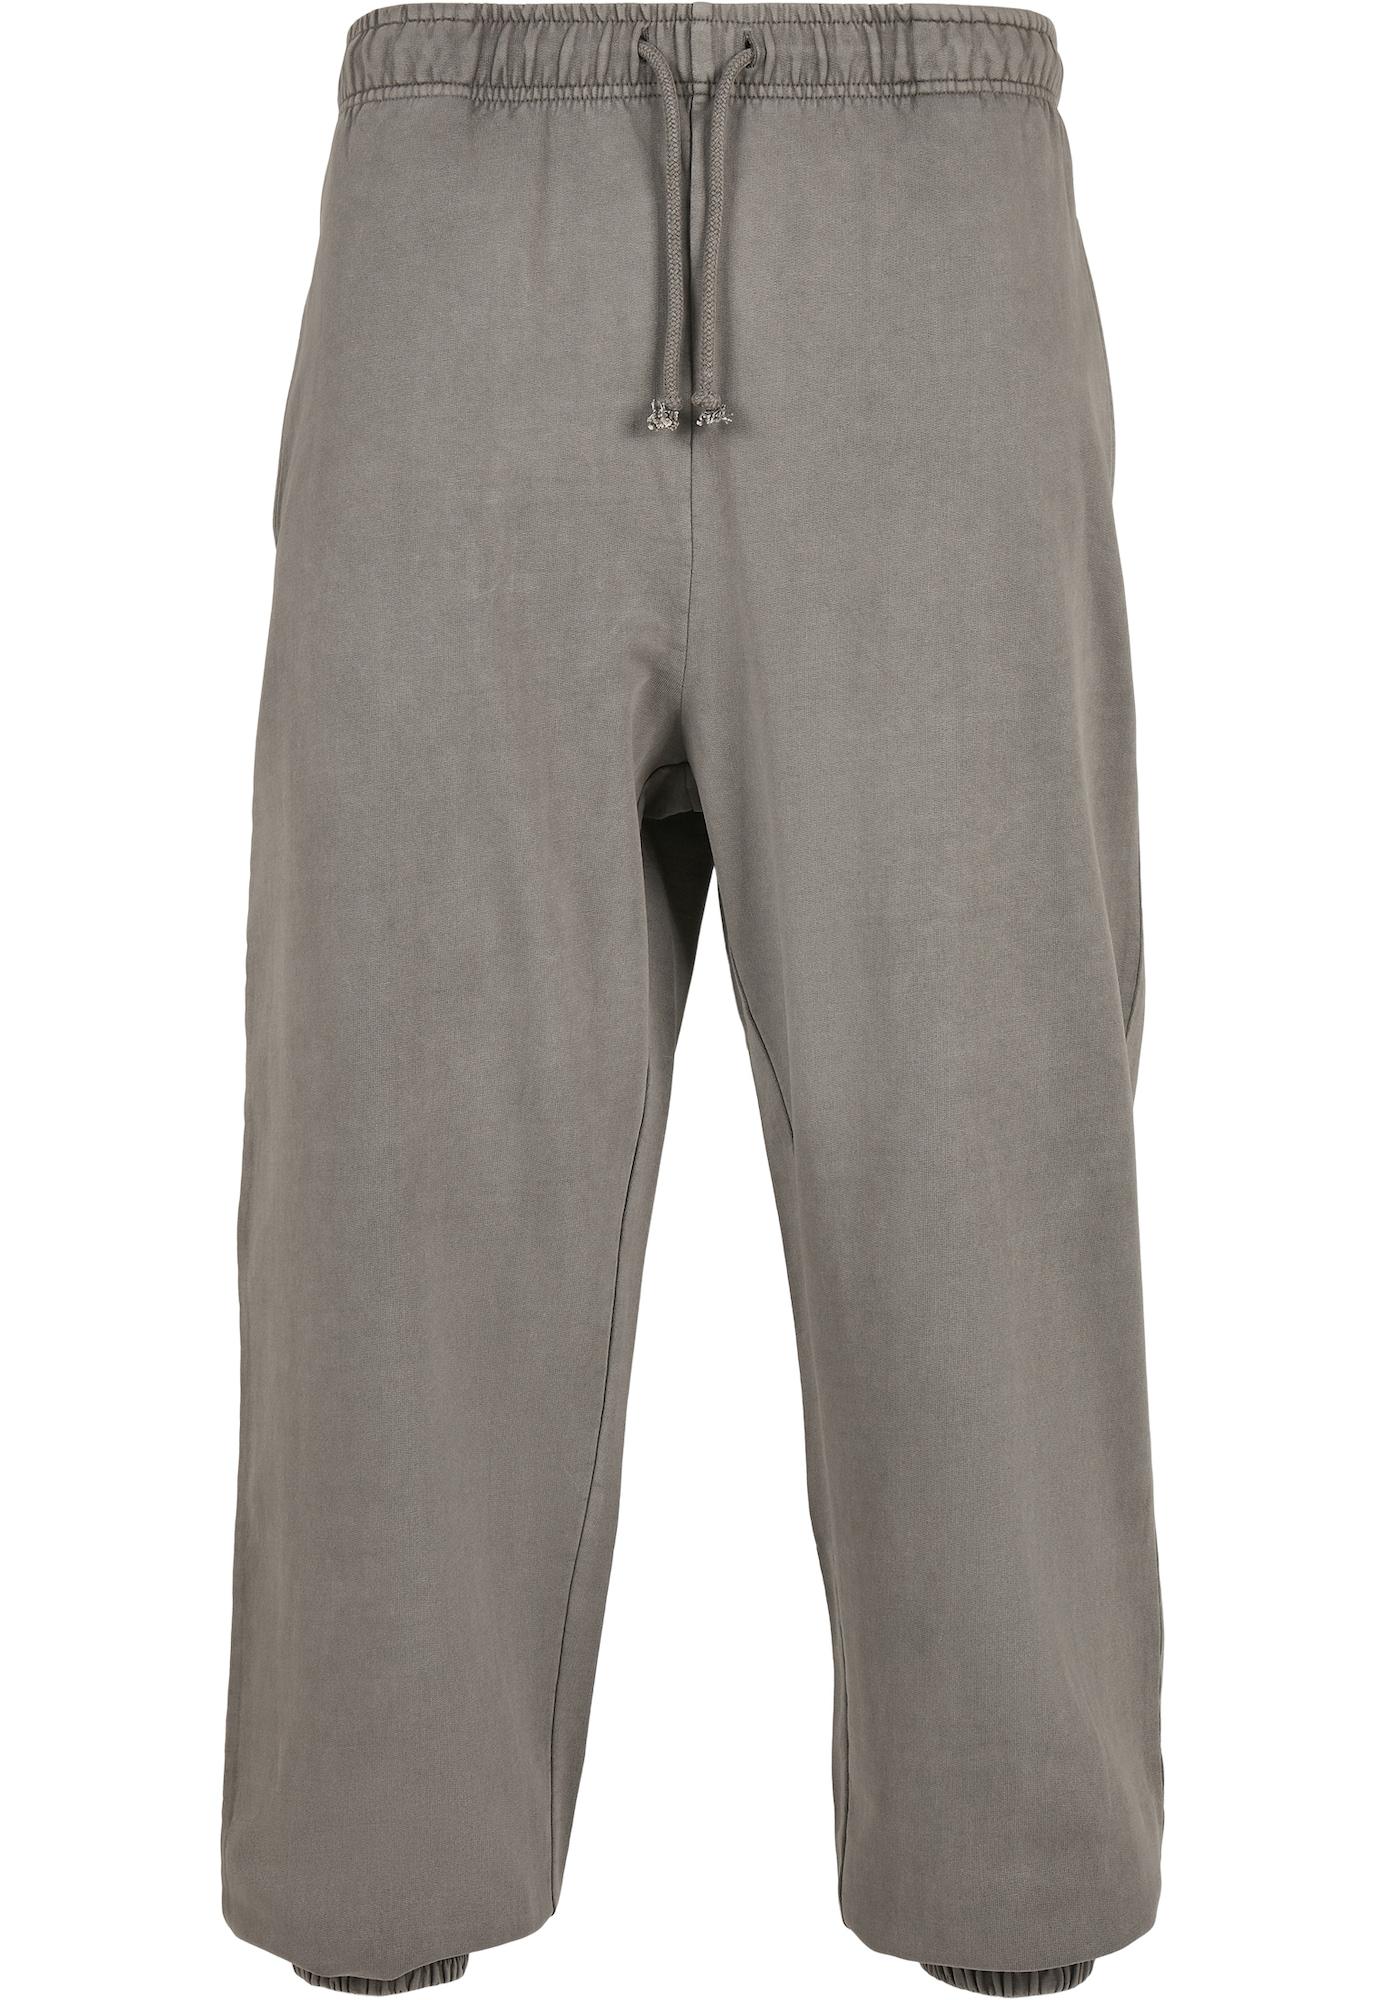 Urban Classics Plus Size Kelnės pilka